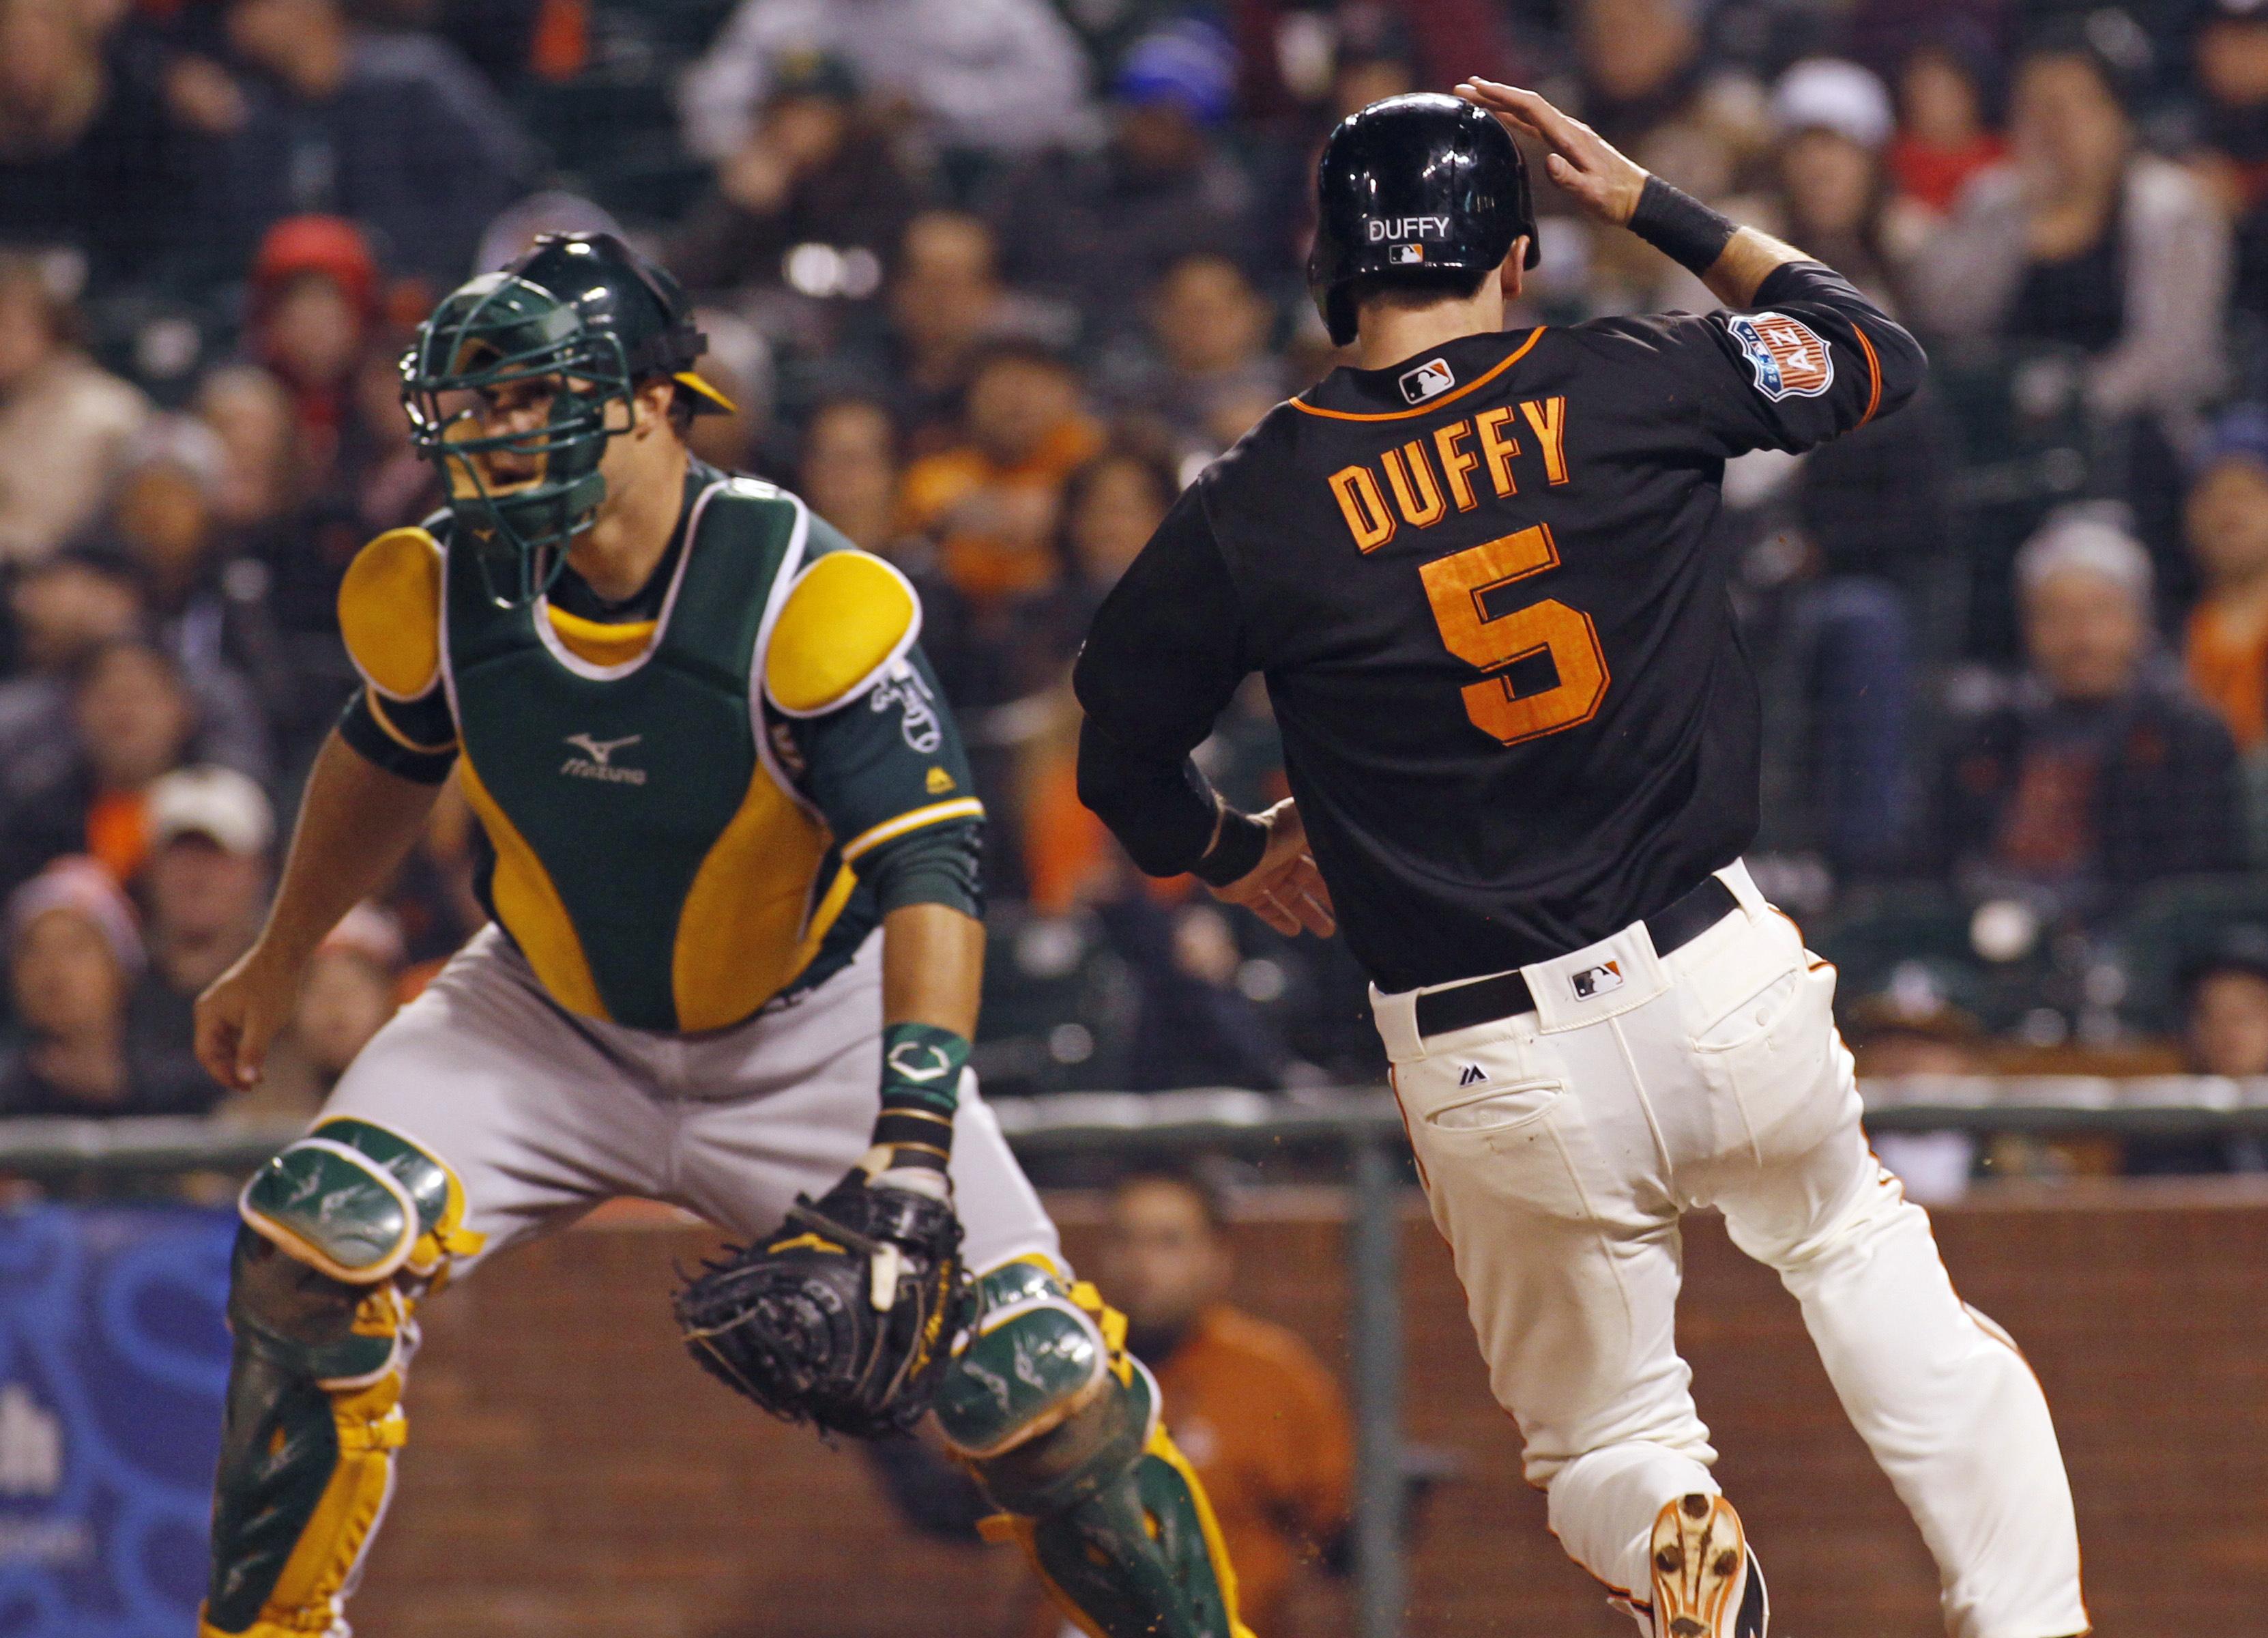 San Francisco Giants' Matt Duffy scores on a Gregor Blanco single as Oakland Athletics' Josh Phegley awaits a throw during the seventh inning of an exhibition baseball game, Friday, April 1, 2016, in San Francisco. (AP Photo/George Nikitin)